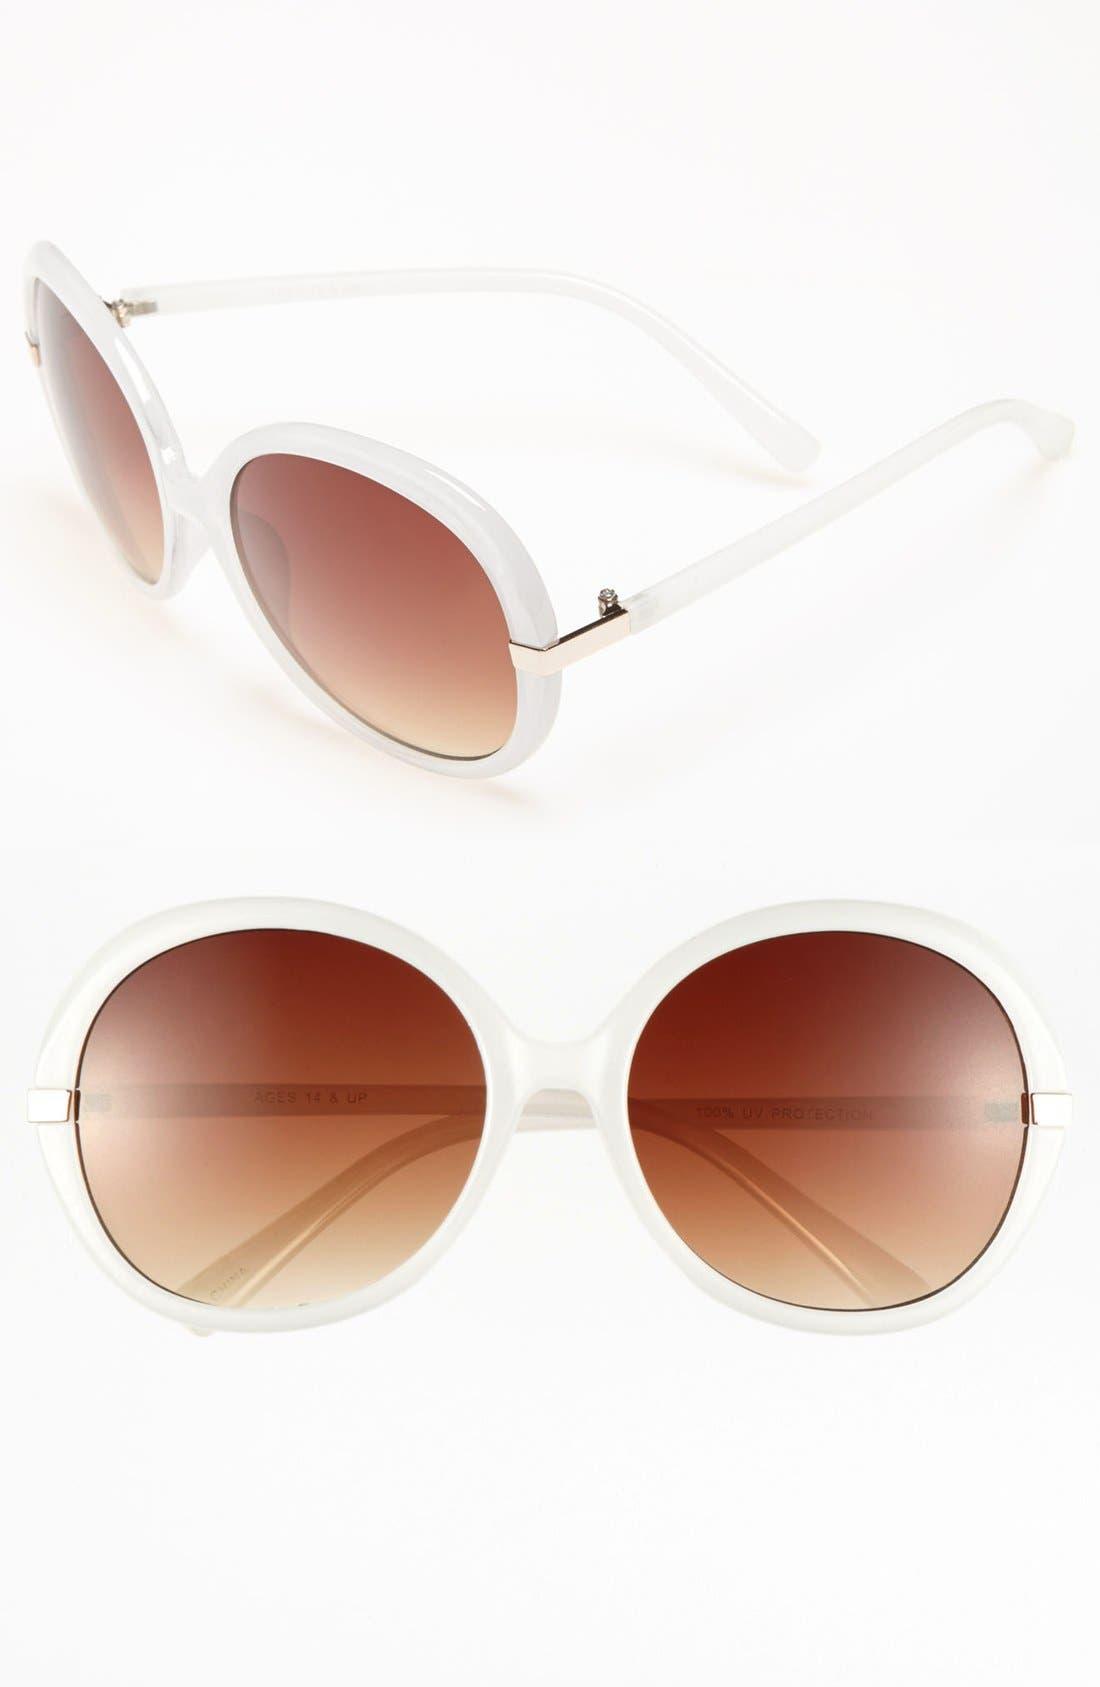 Alternate Image 1 Selected - FE NY 'Brooke' Sunglasses